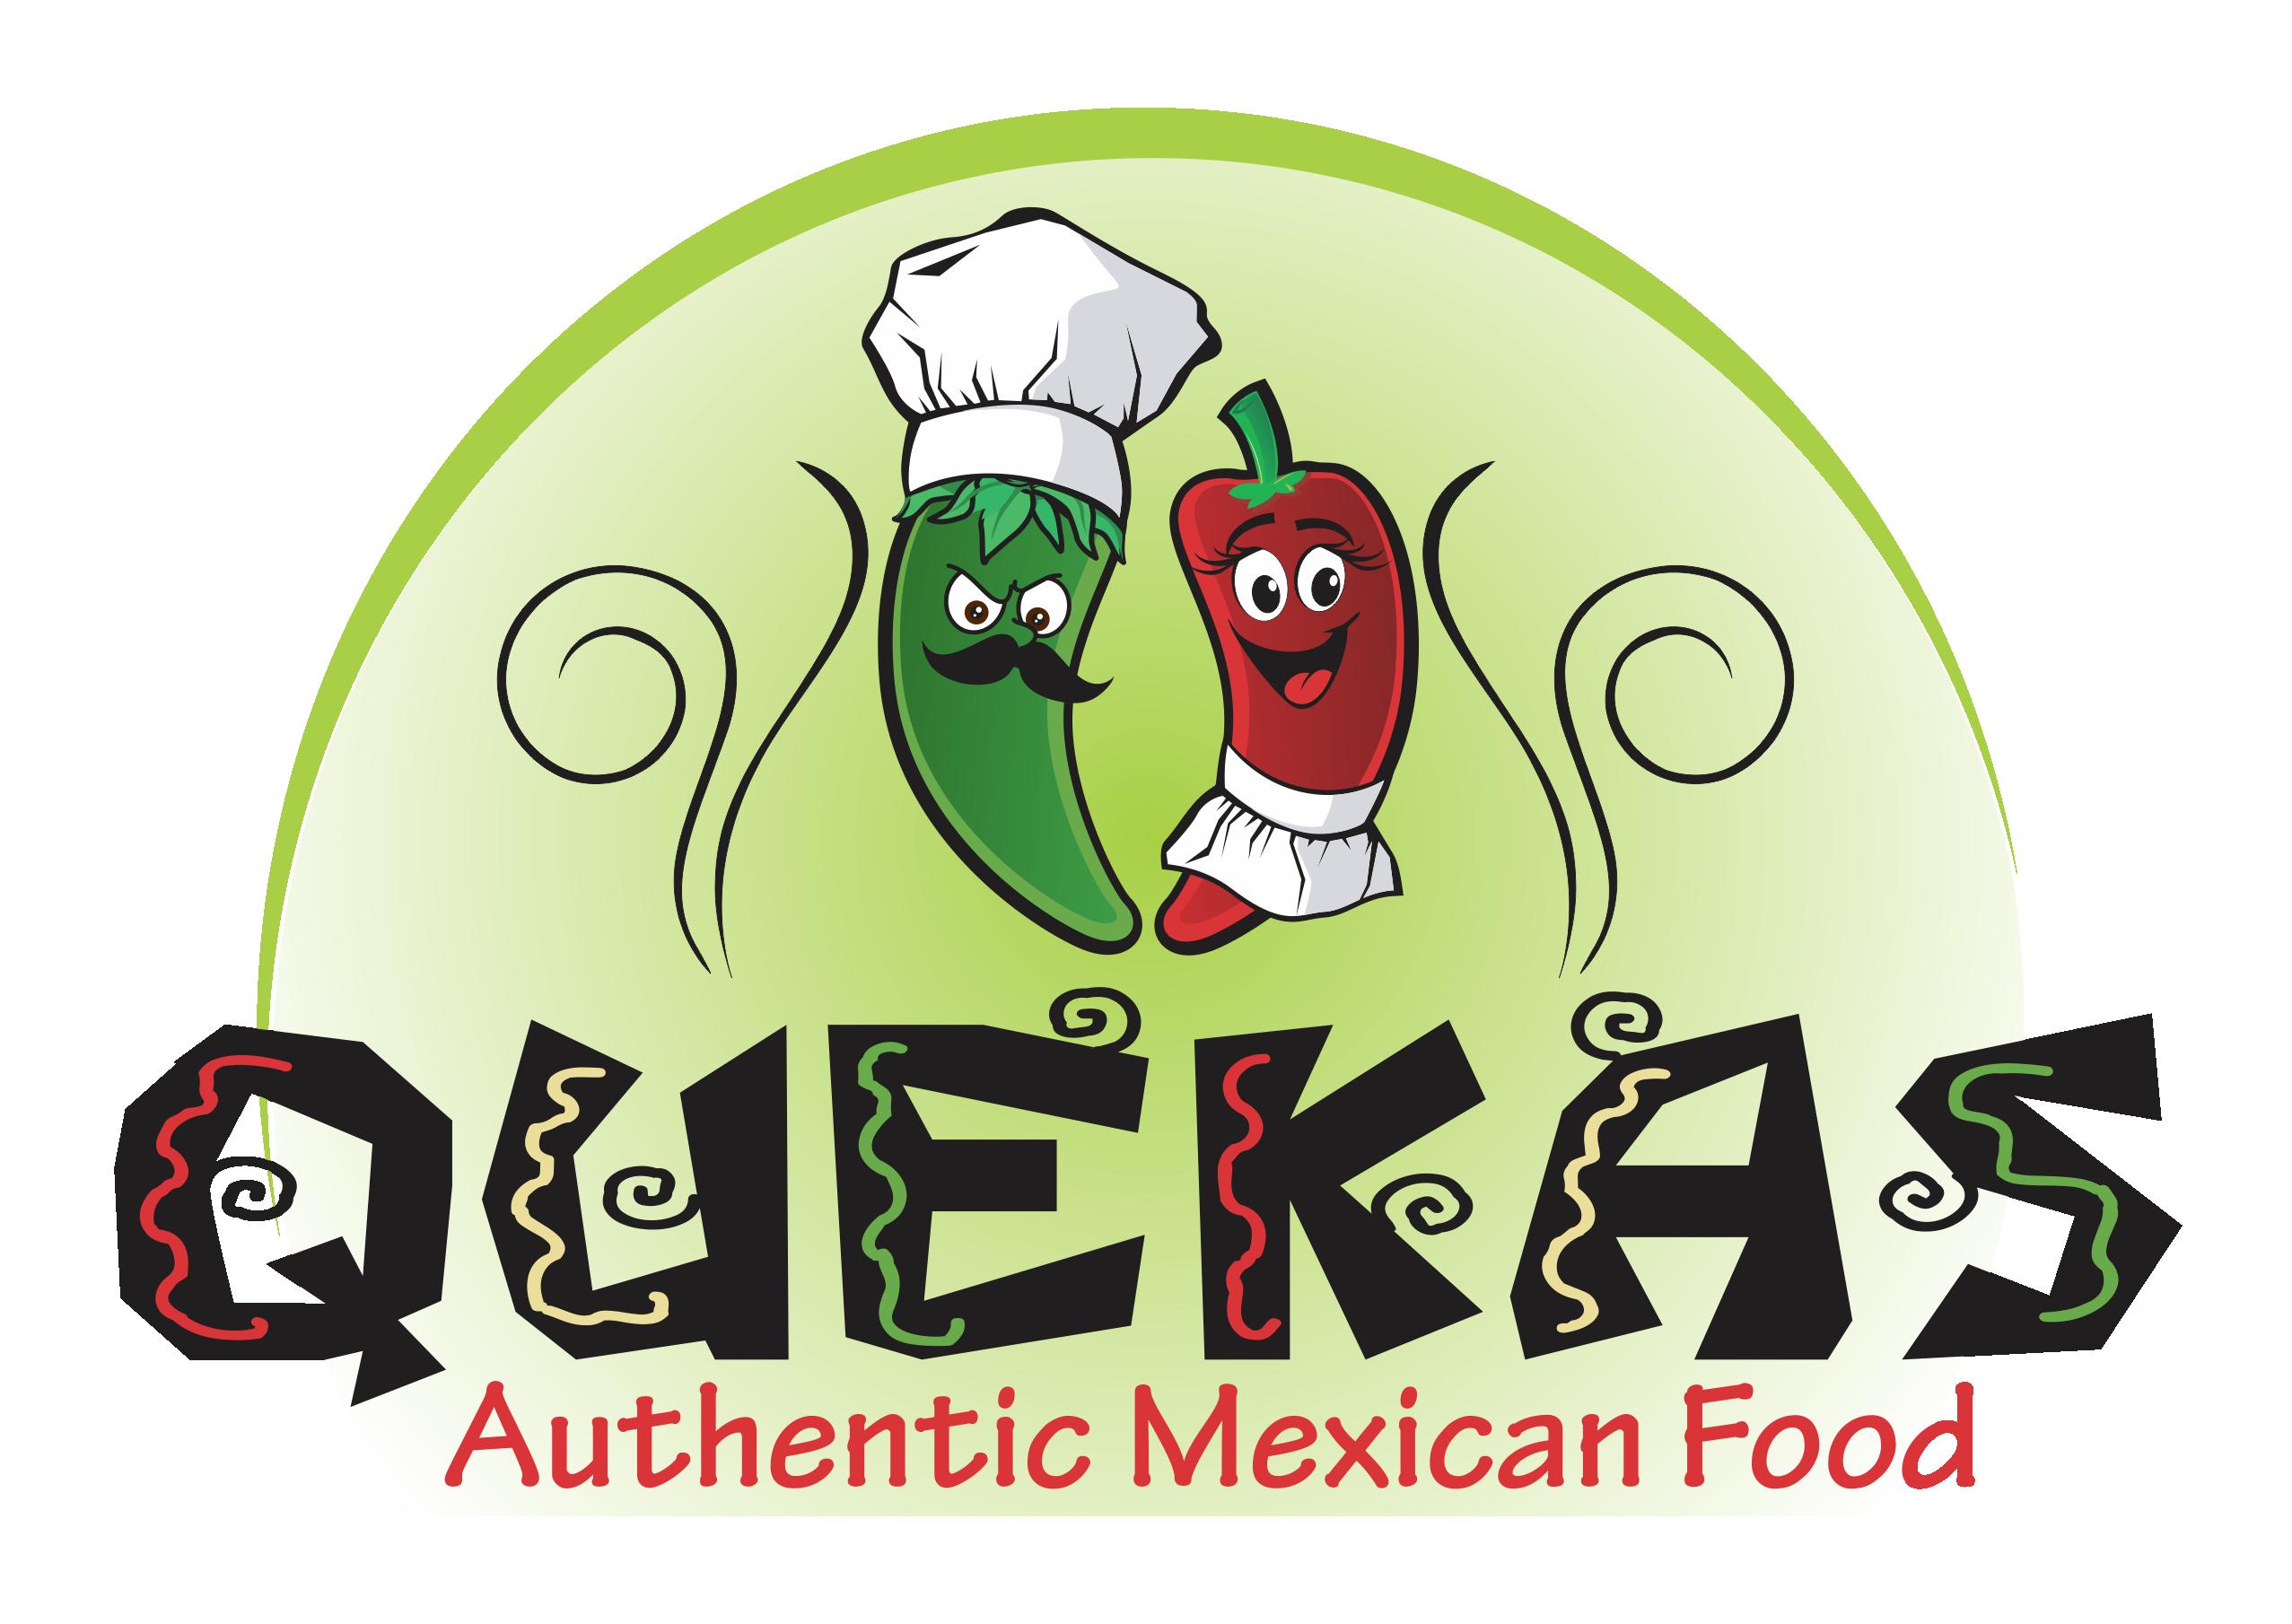 Luncheon clipart bring a plate. Quekas authentic mexican restaurant